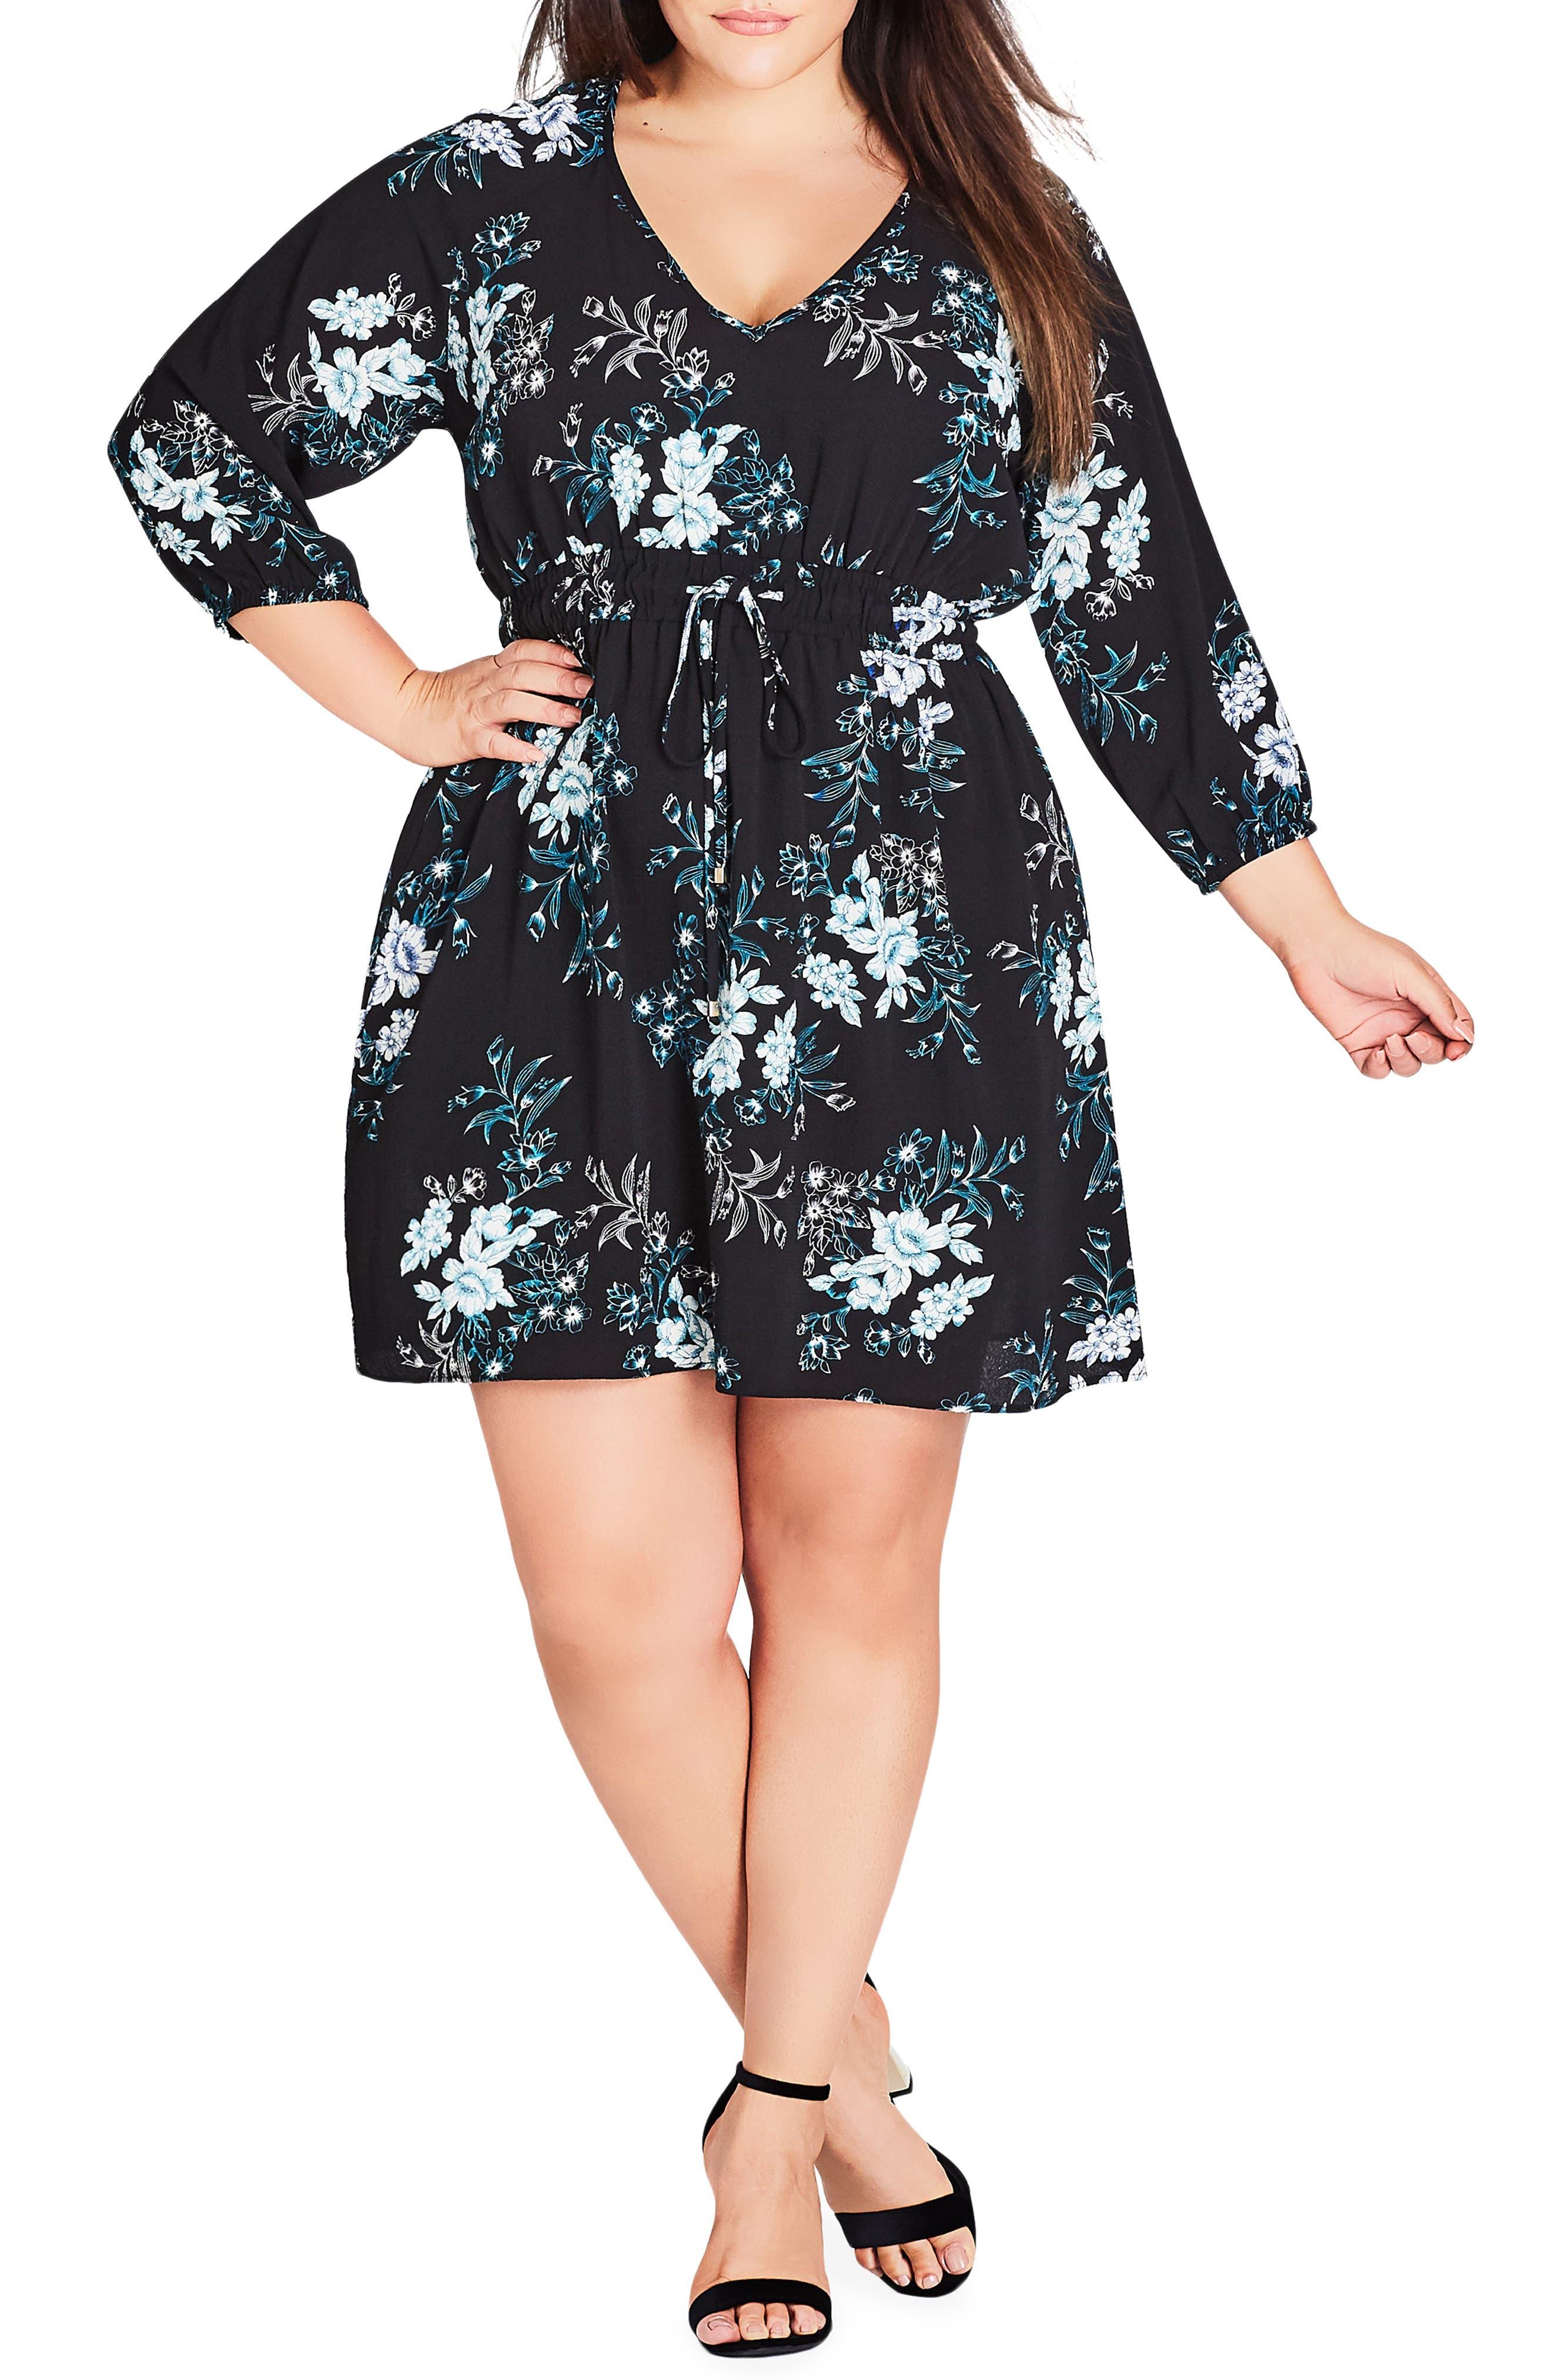 Plus Size City Chic Kaori Floral Drawstring Tunic, Black